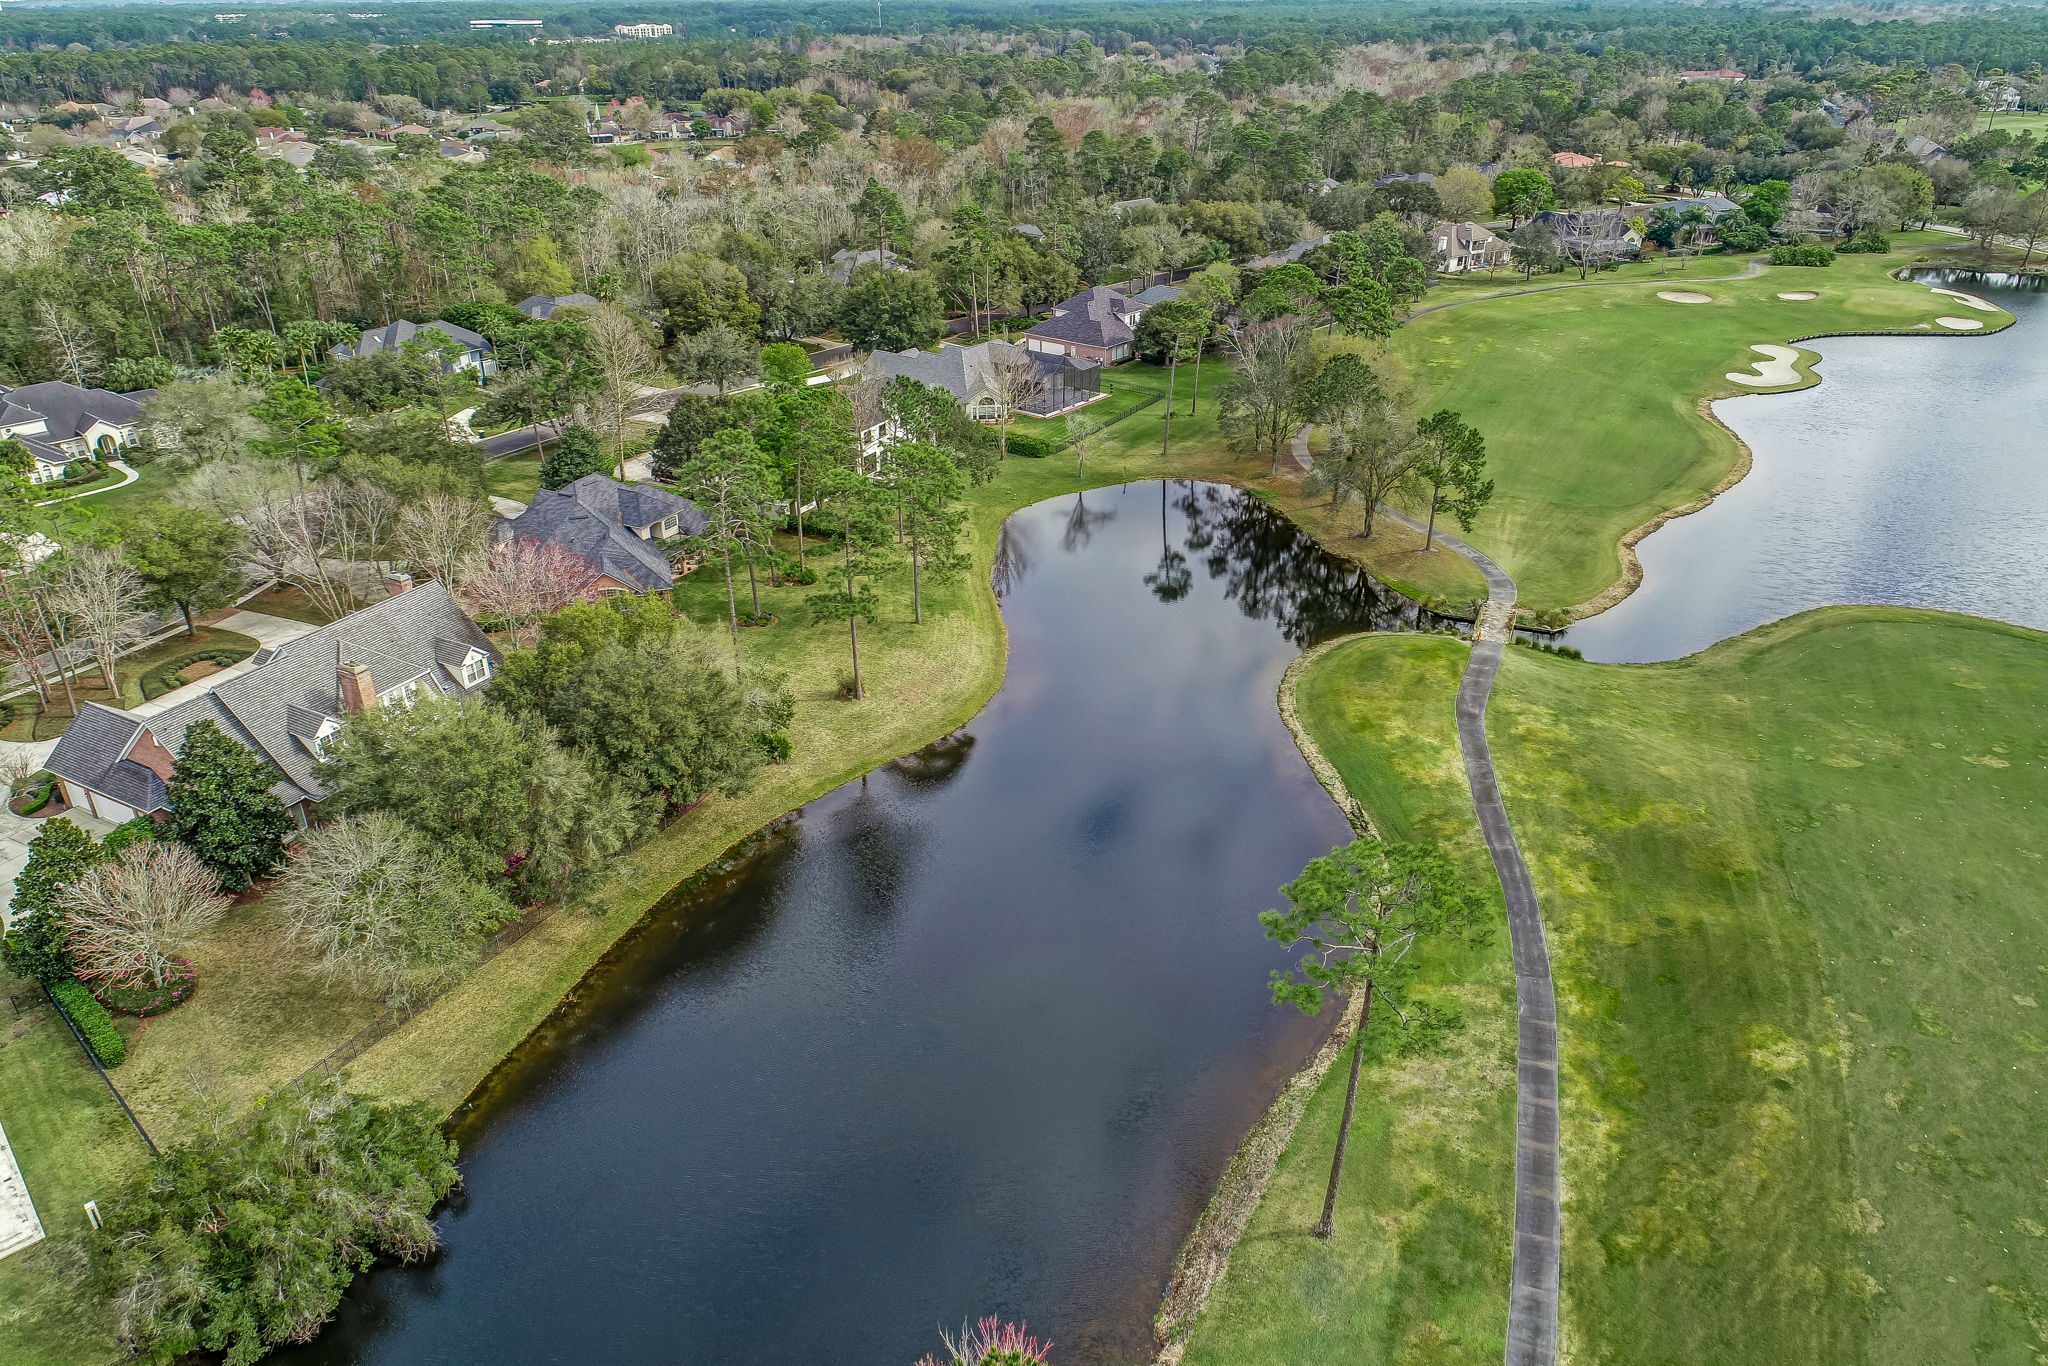 4538 Swilcan Bridge Ln N Aerial View